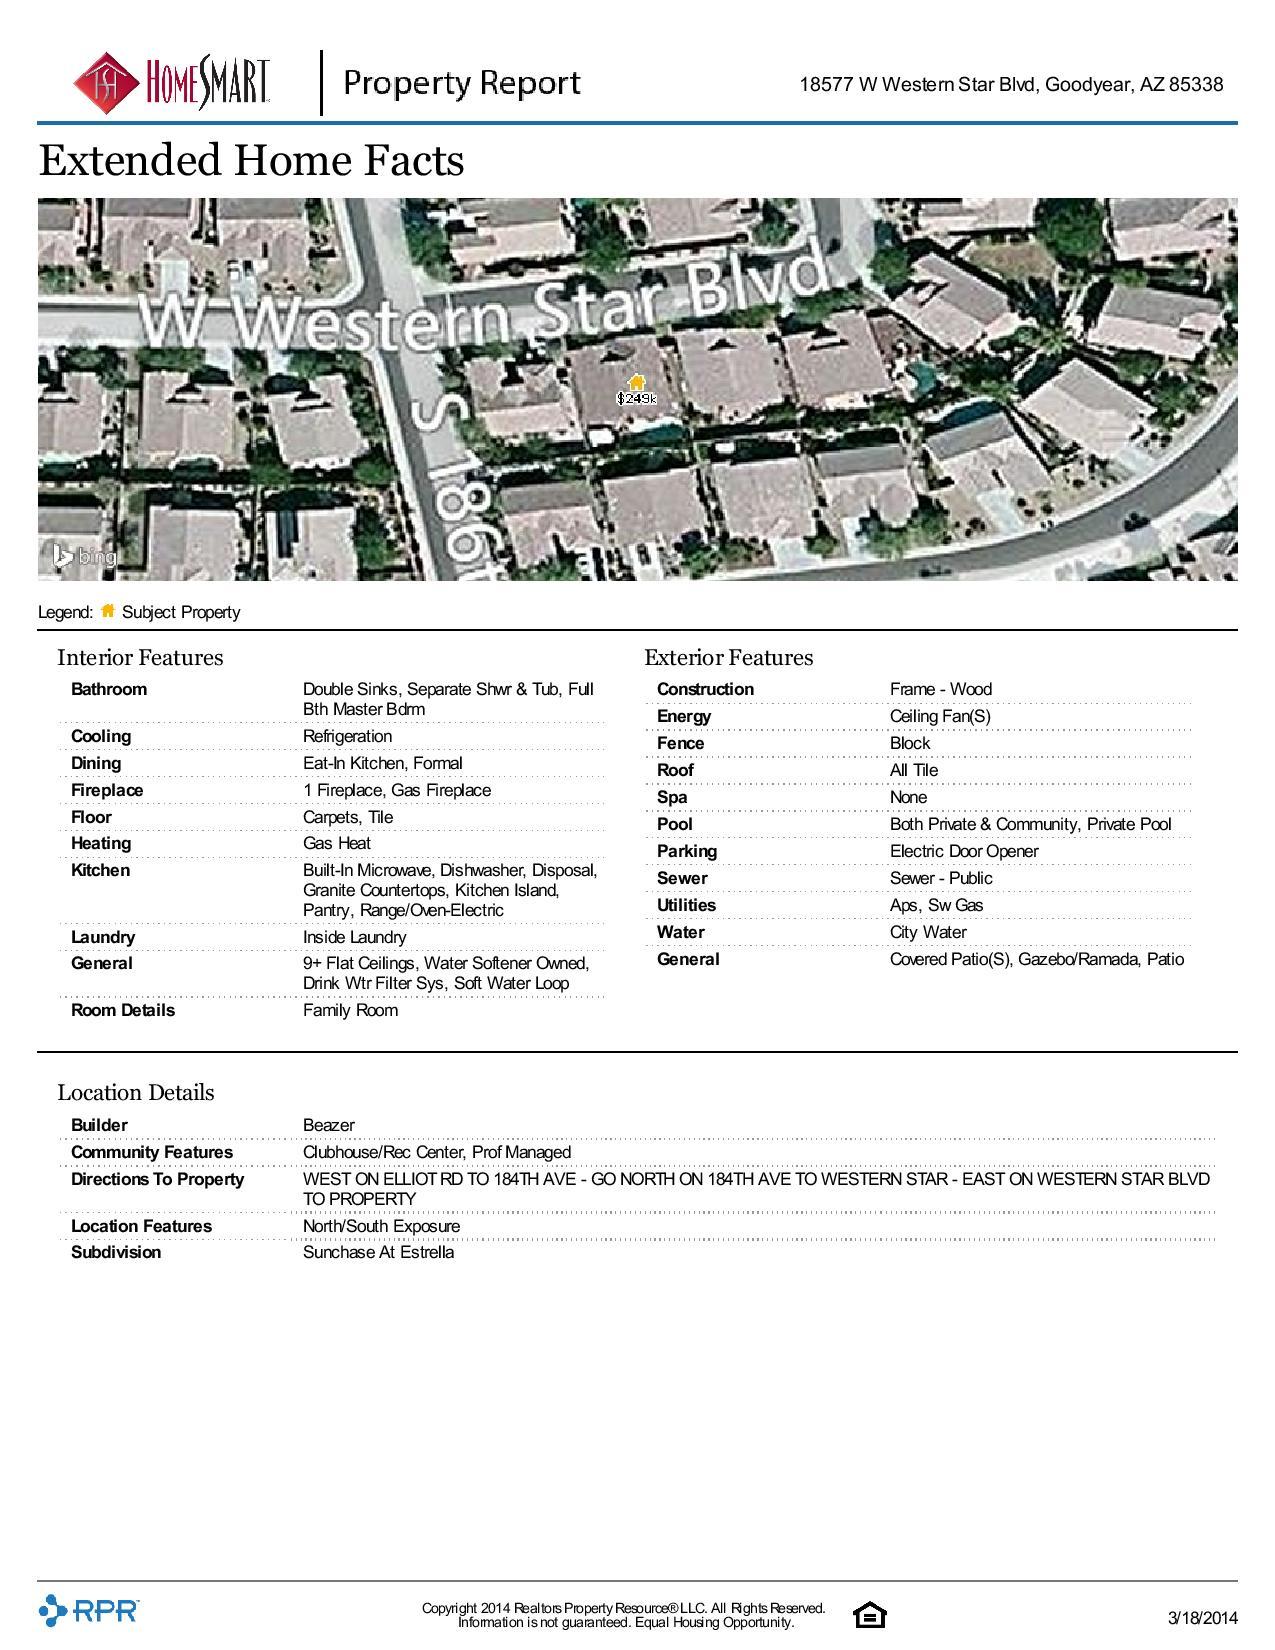 18577-W-Western-Star-Blvd-Goodyear-AZ-85338-page-004